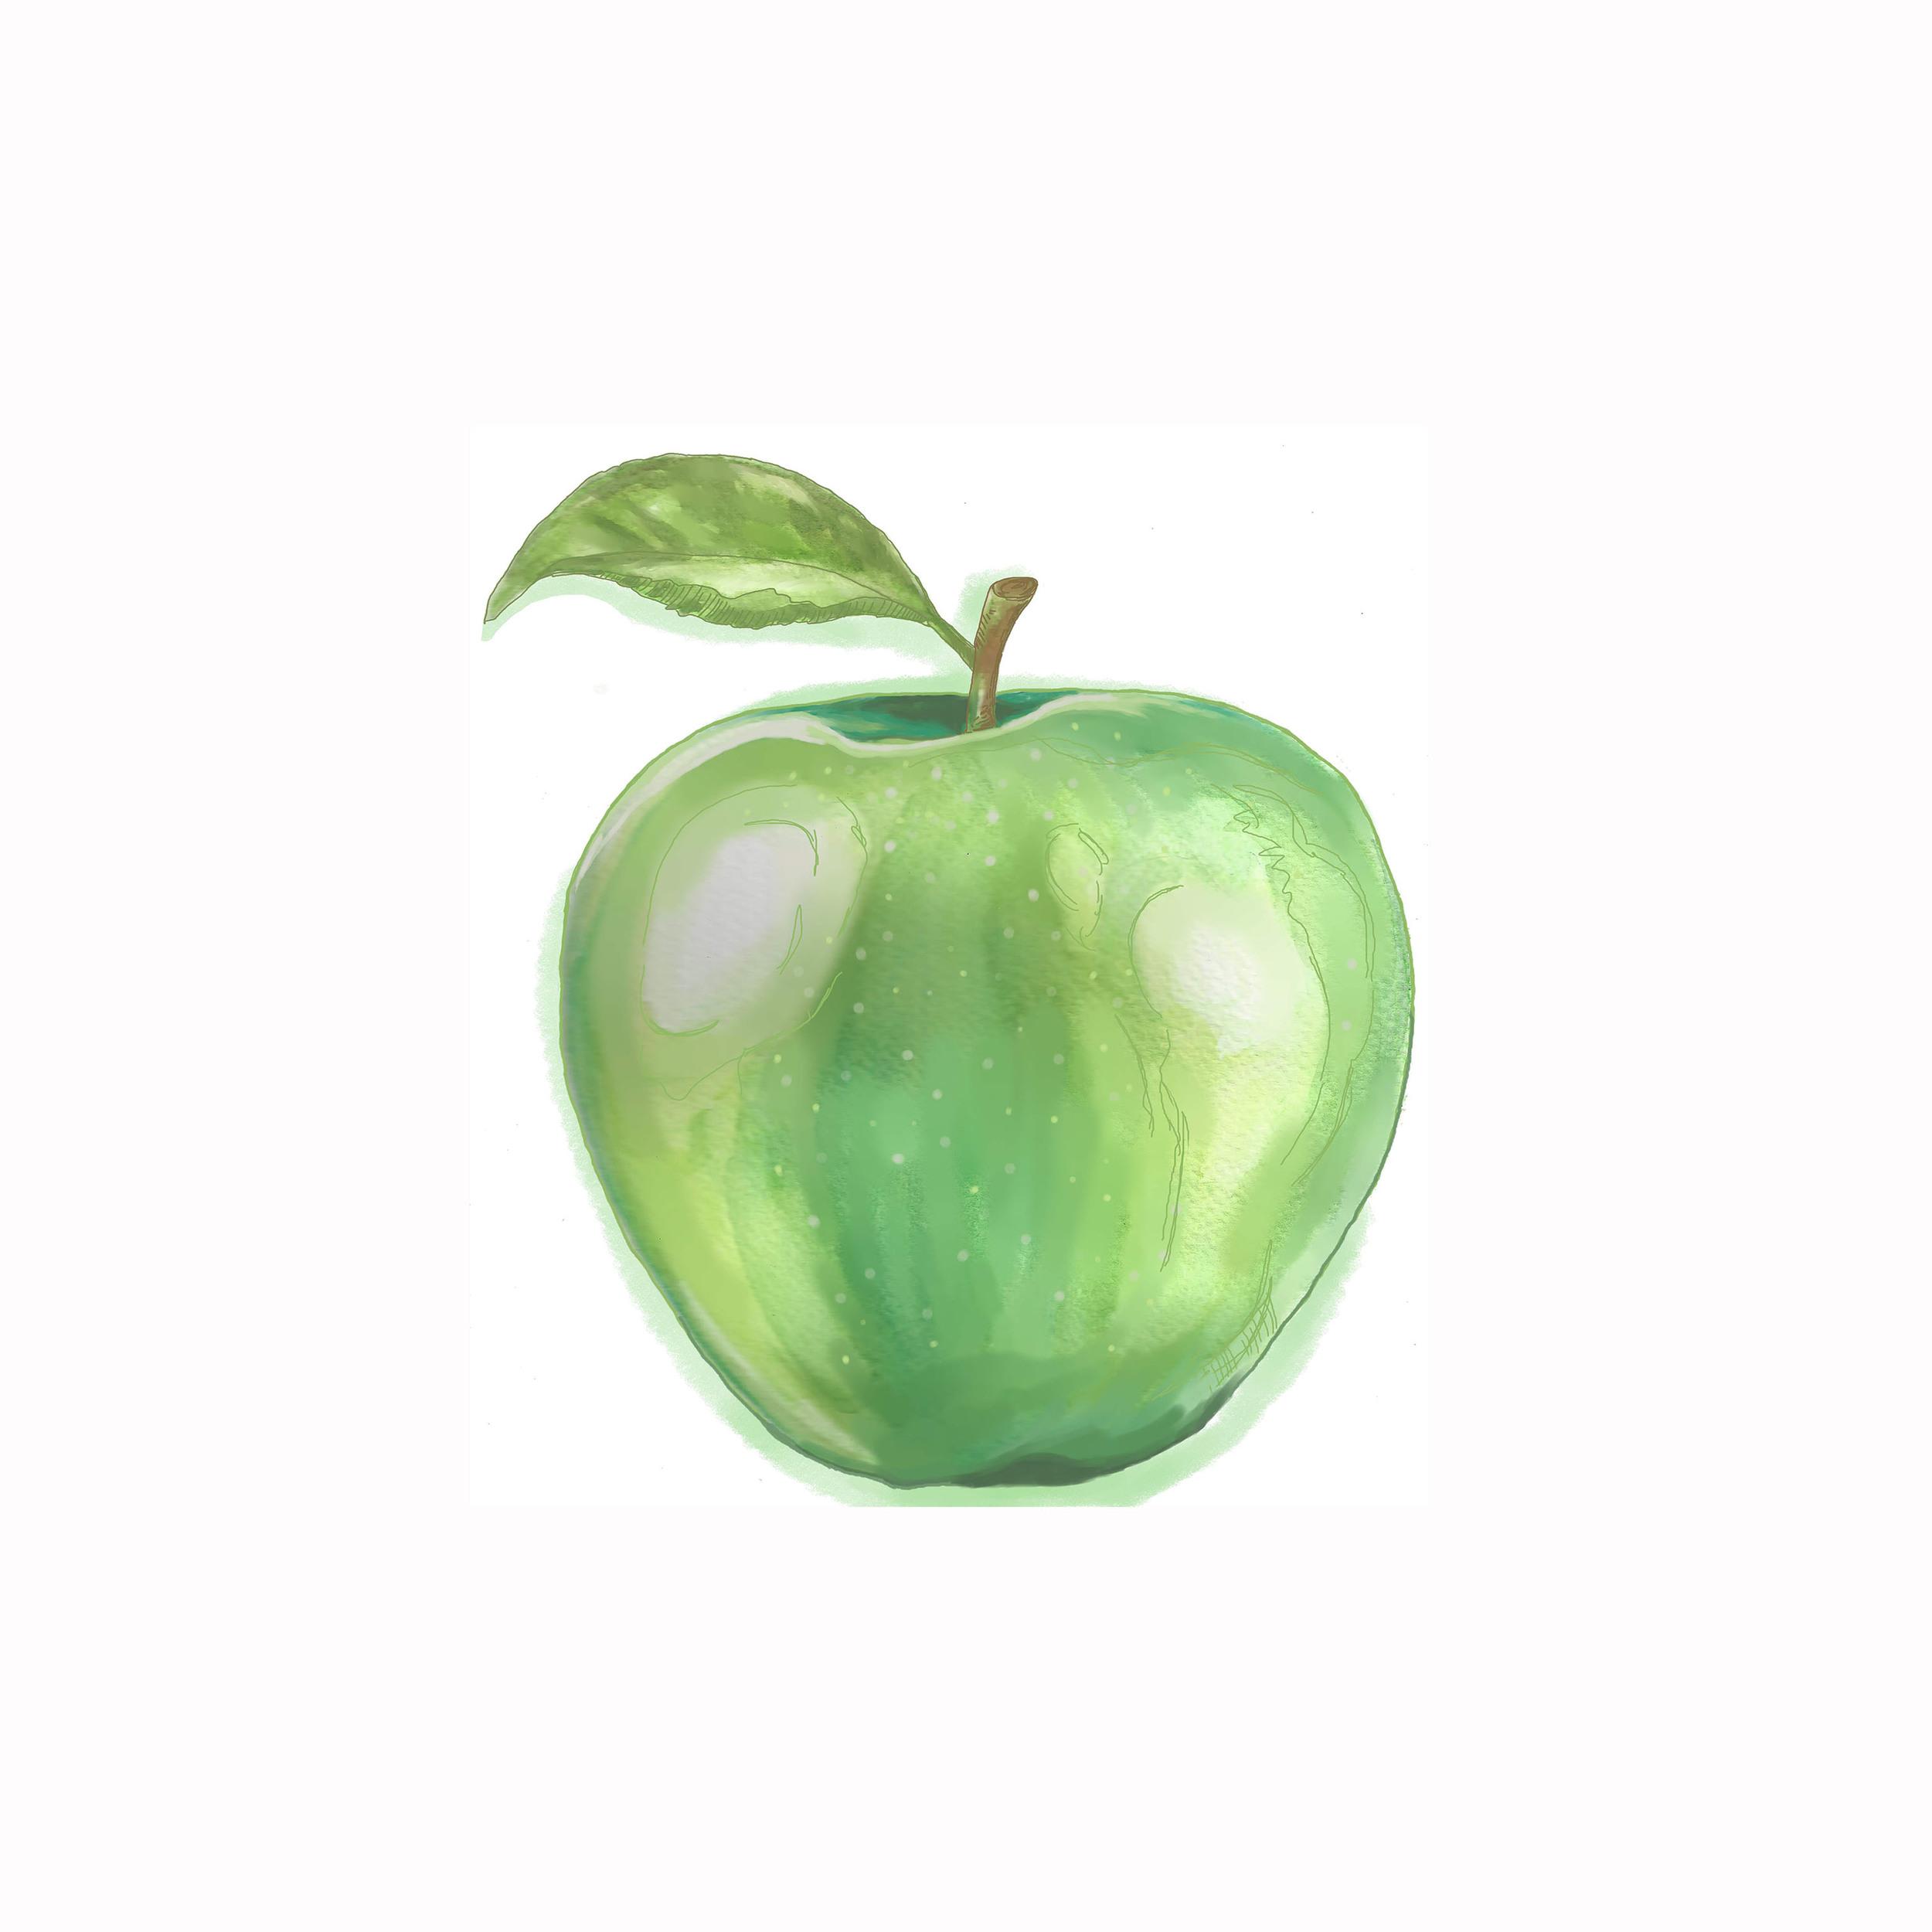 - apple illustration -